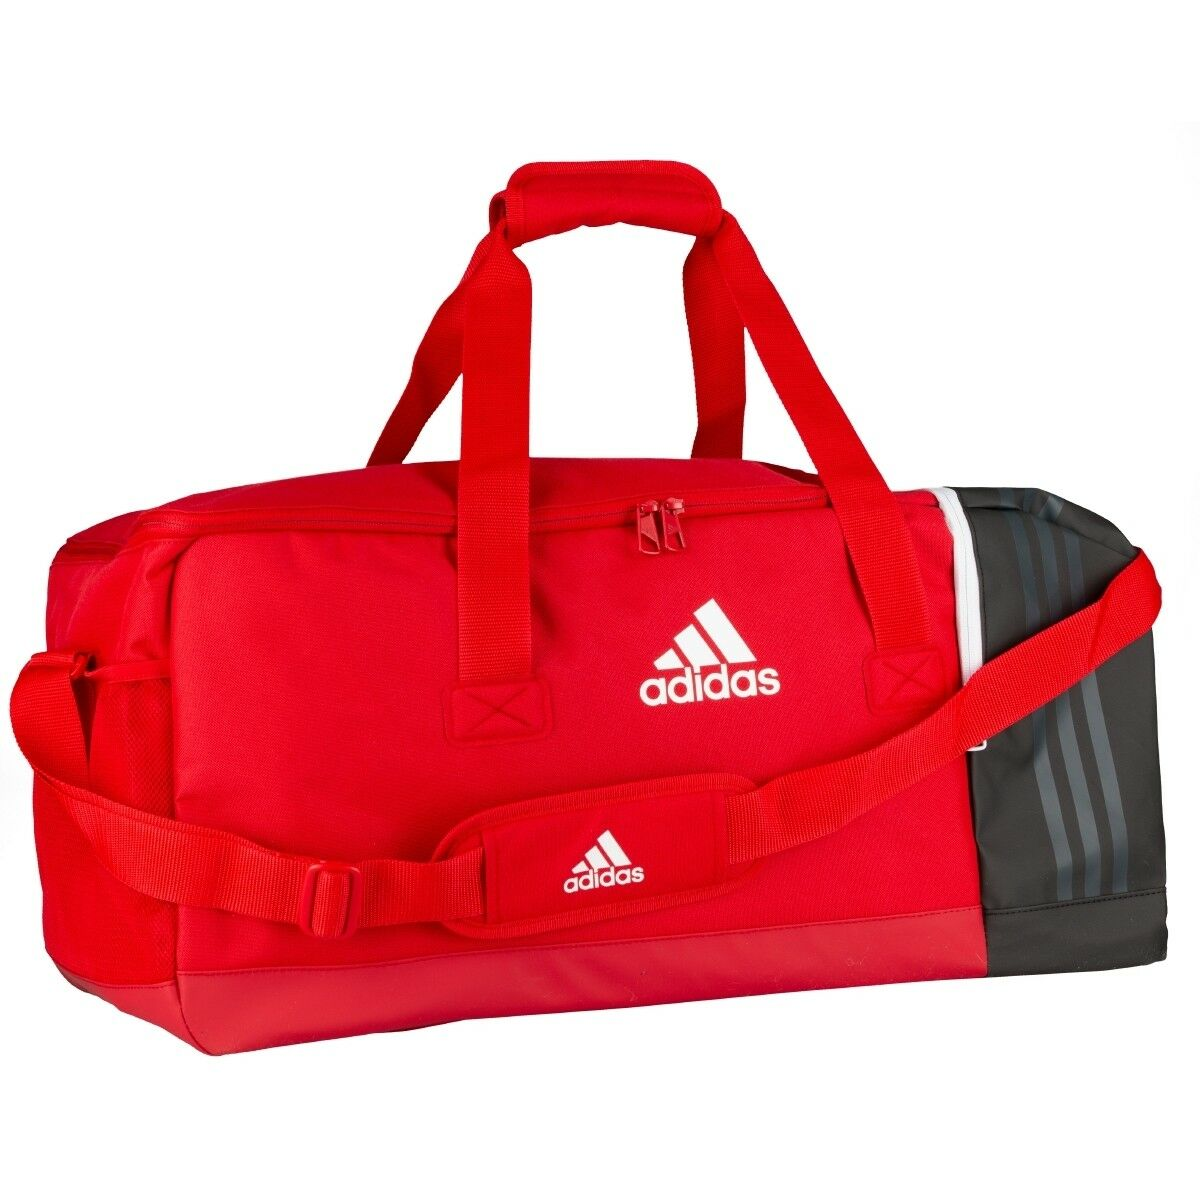 Adidas Tiro Team Bag L Sports Bag Bag  Original Travel Bag Scarlet BS4744  leisure